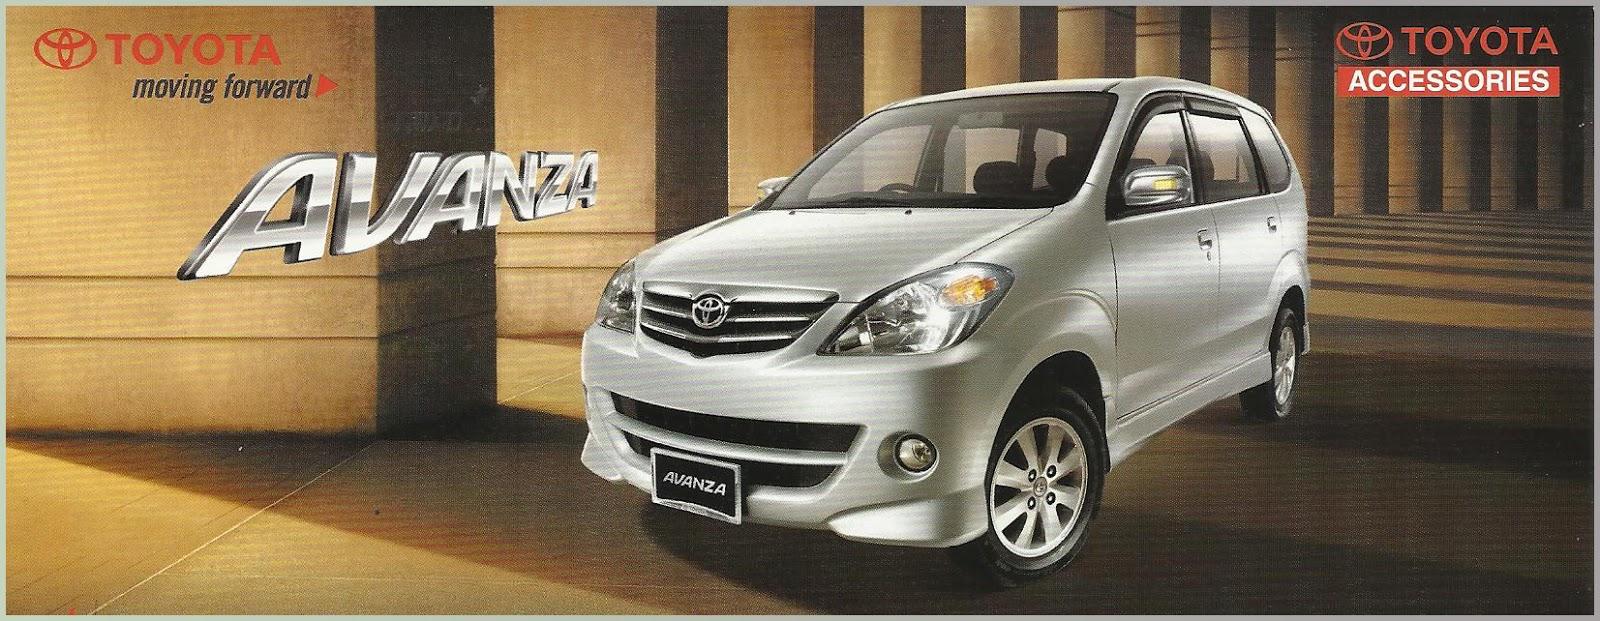 New Yaris Trd Sportivo 2014 Cover Jok Grand Avanza Toyota Genuine Accessories :